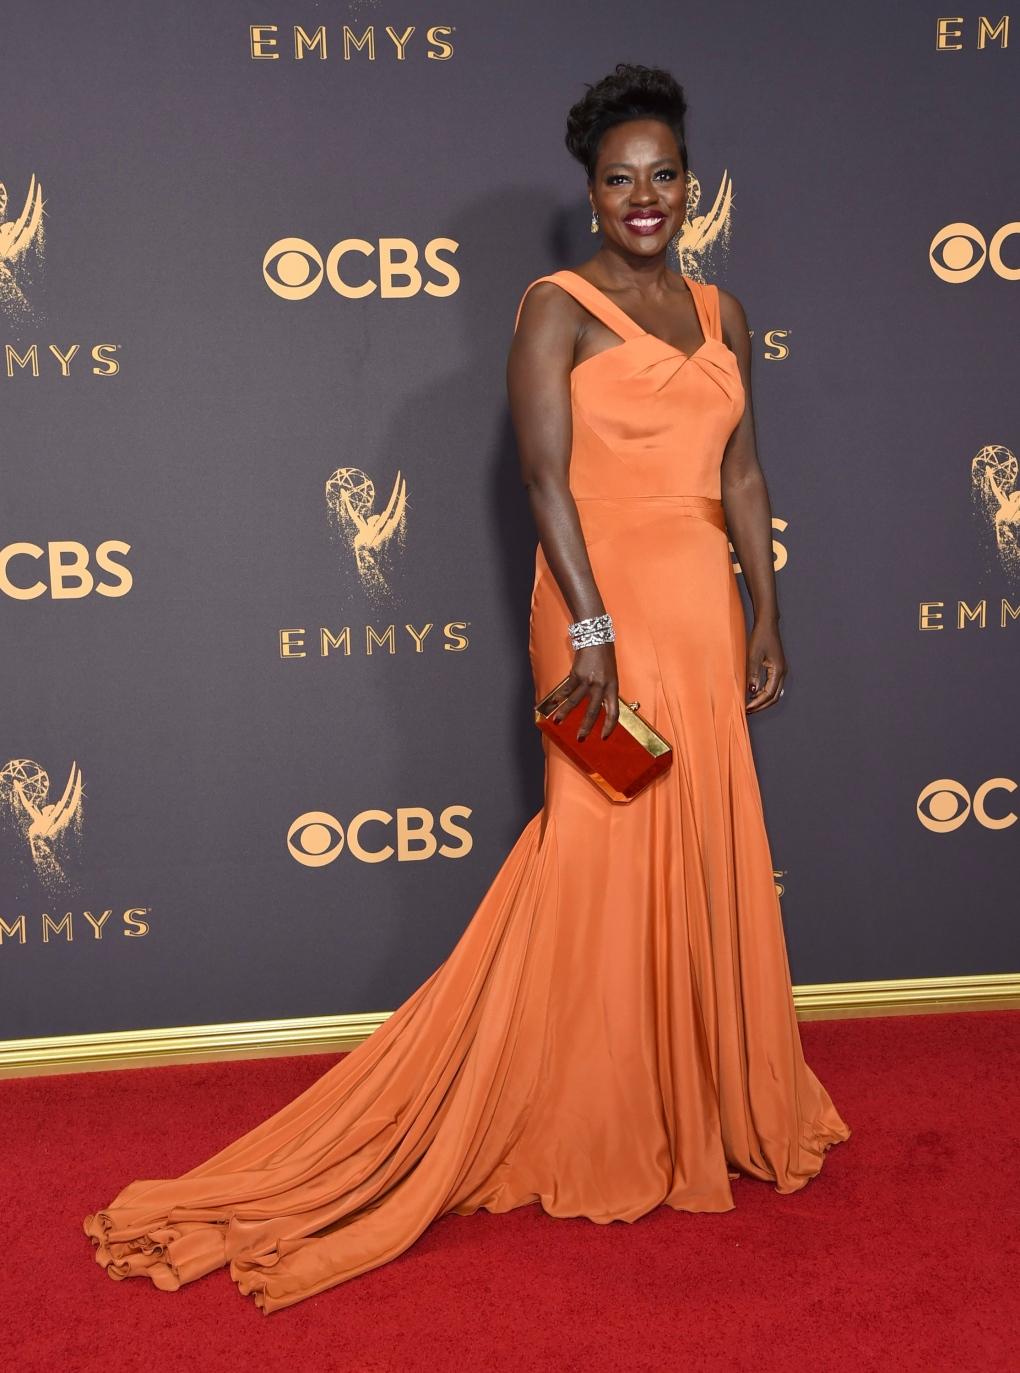 Stars shine at the 2017 Emmy Awards   CTV News